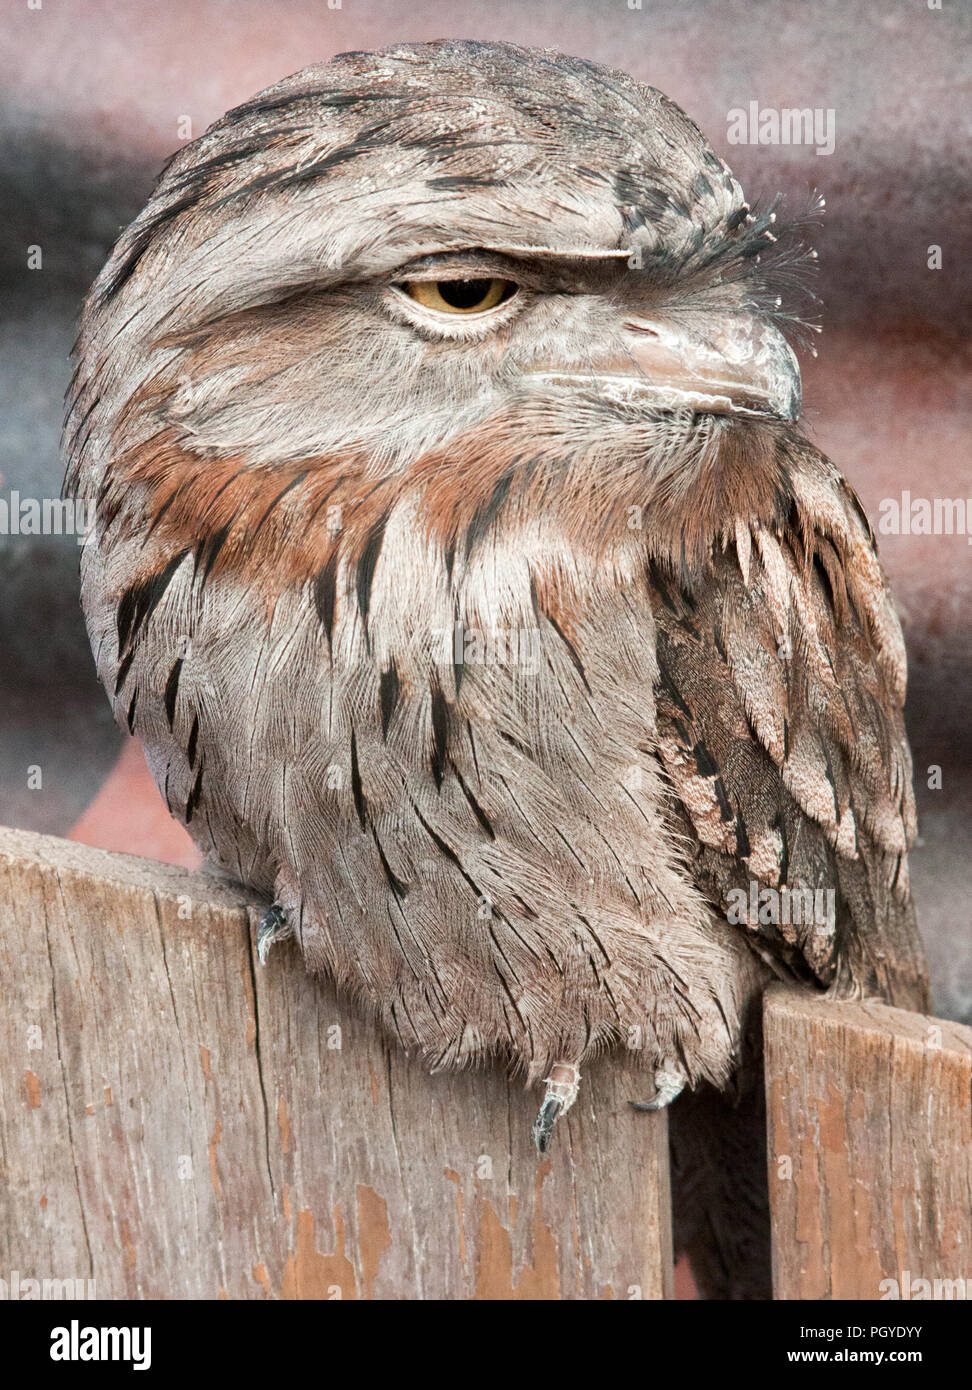 Tawny frogmouth (Podargus strigoides) perched on wodden fence Stock Photo